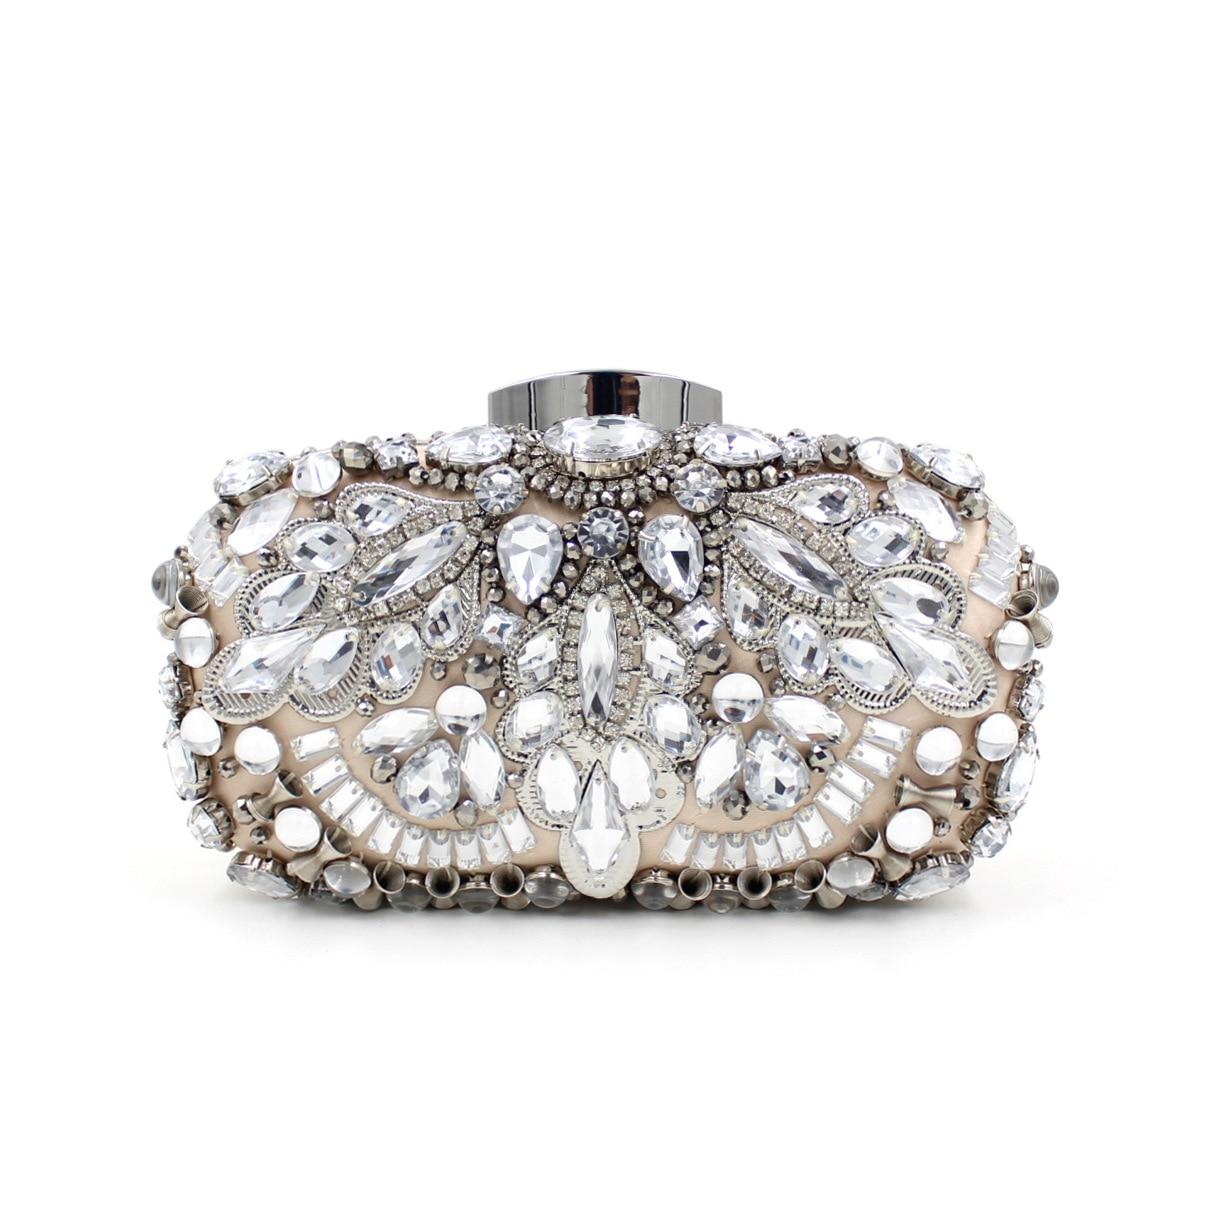 LLJUNDUI Nueva Llegada Shiny Ladies Pesado Diamante-tachonado Vestido Bordado Gl